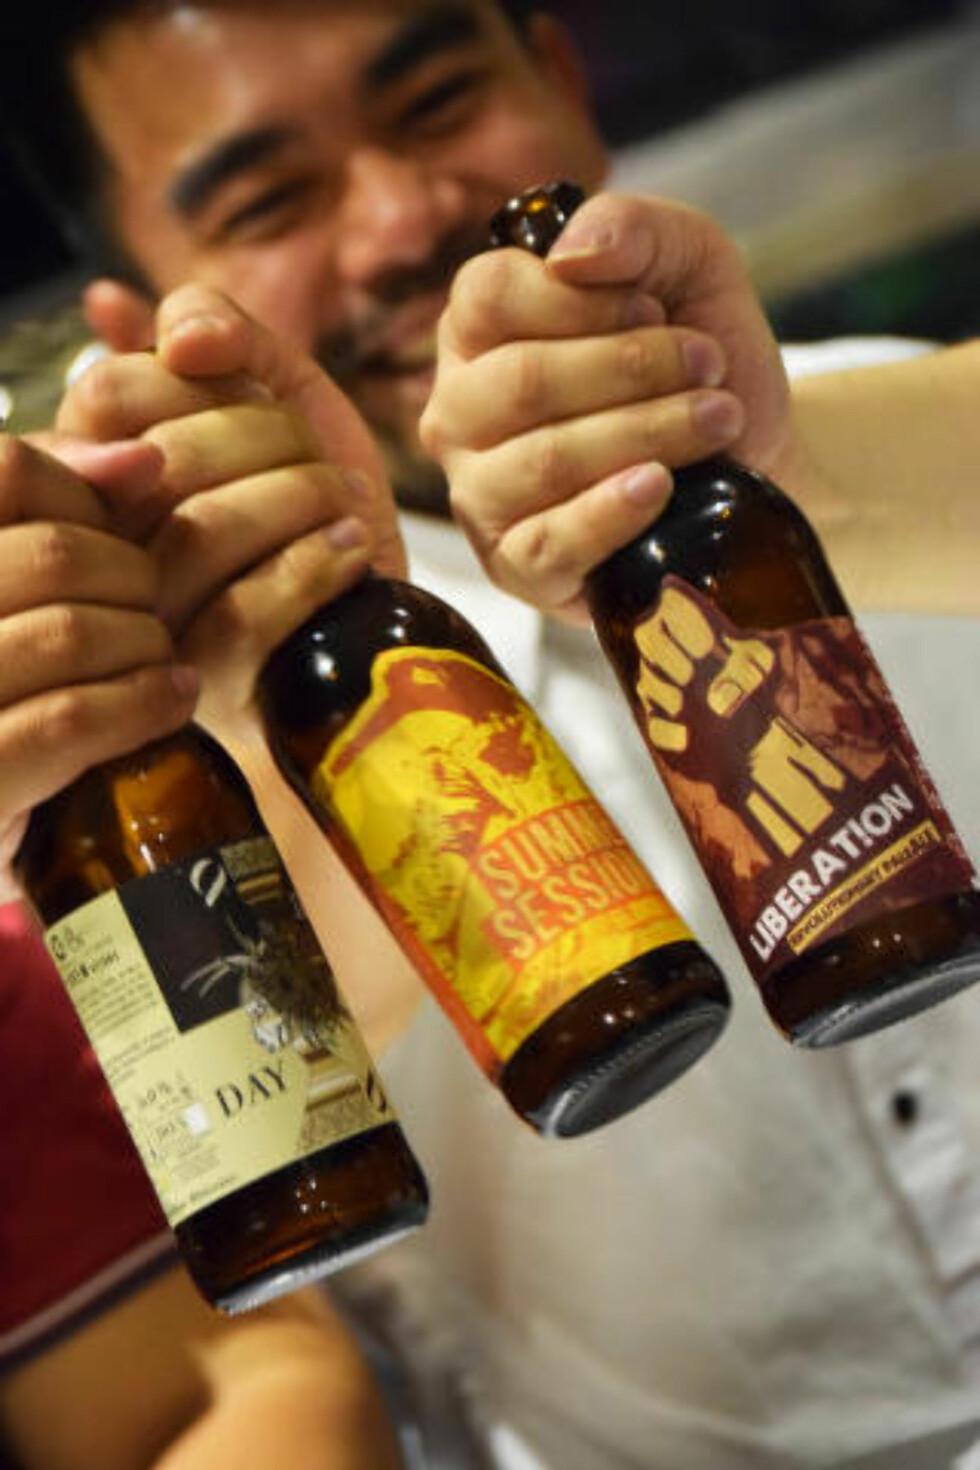 MER ENN PILS: Craftpoint Brewing ville befri befolkningen fra tankegangen om at øl er ensbetydende med pils. Foto: MARI BAREKSTEN